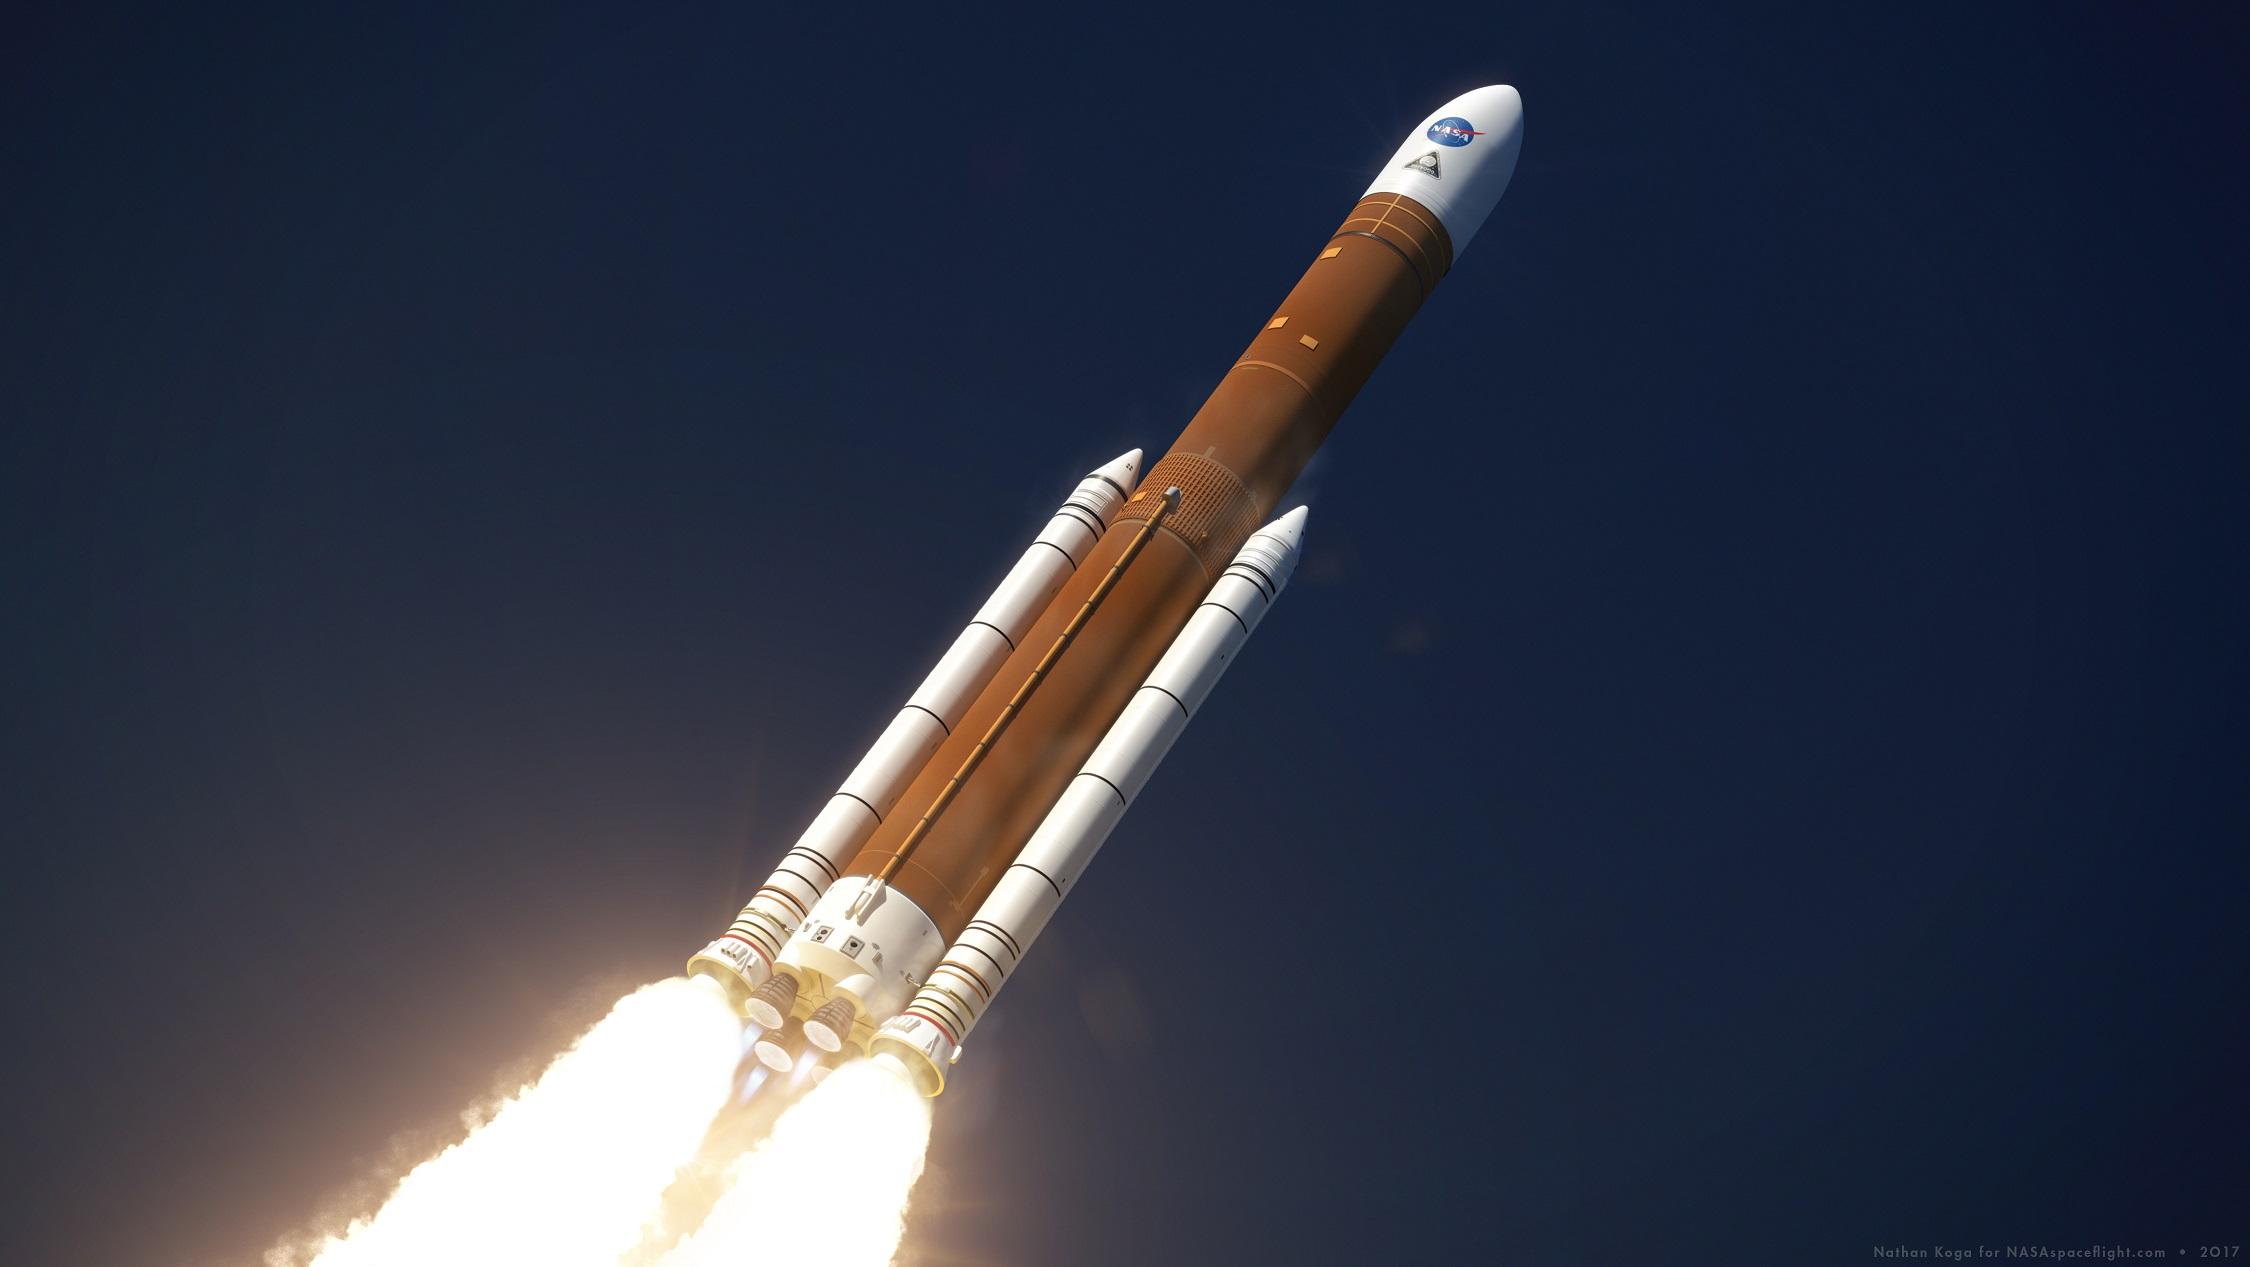 NASA completes Exploration Upper Stage CDR, focuses new office on SLS Block 1B development